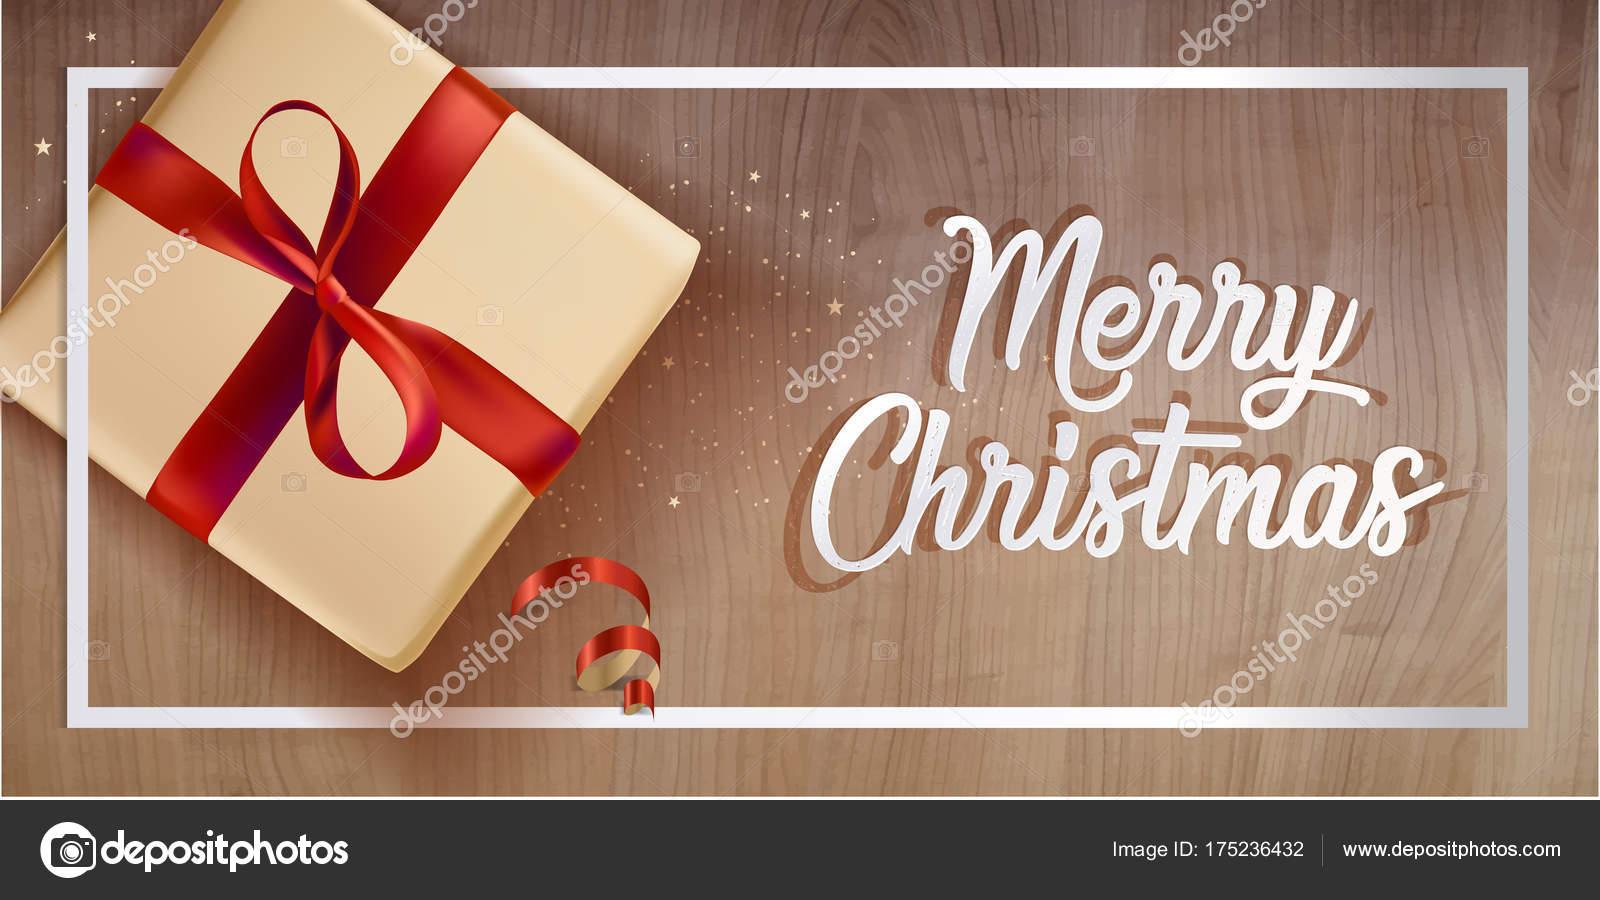 Christmas greeting card vector illustration concept greeting cards christmas greeting card vector illustration concept greeting cards website mobile stock vector m4hsunfo